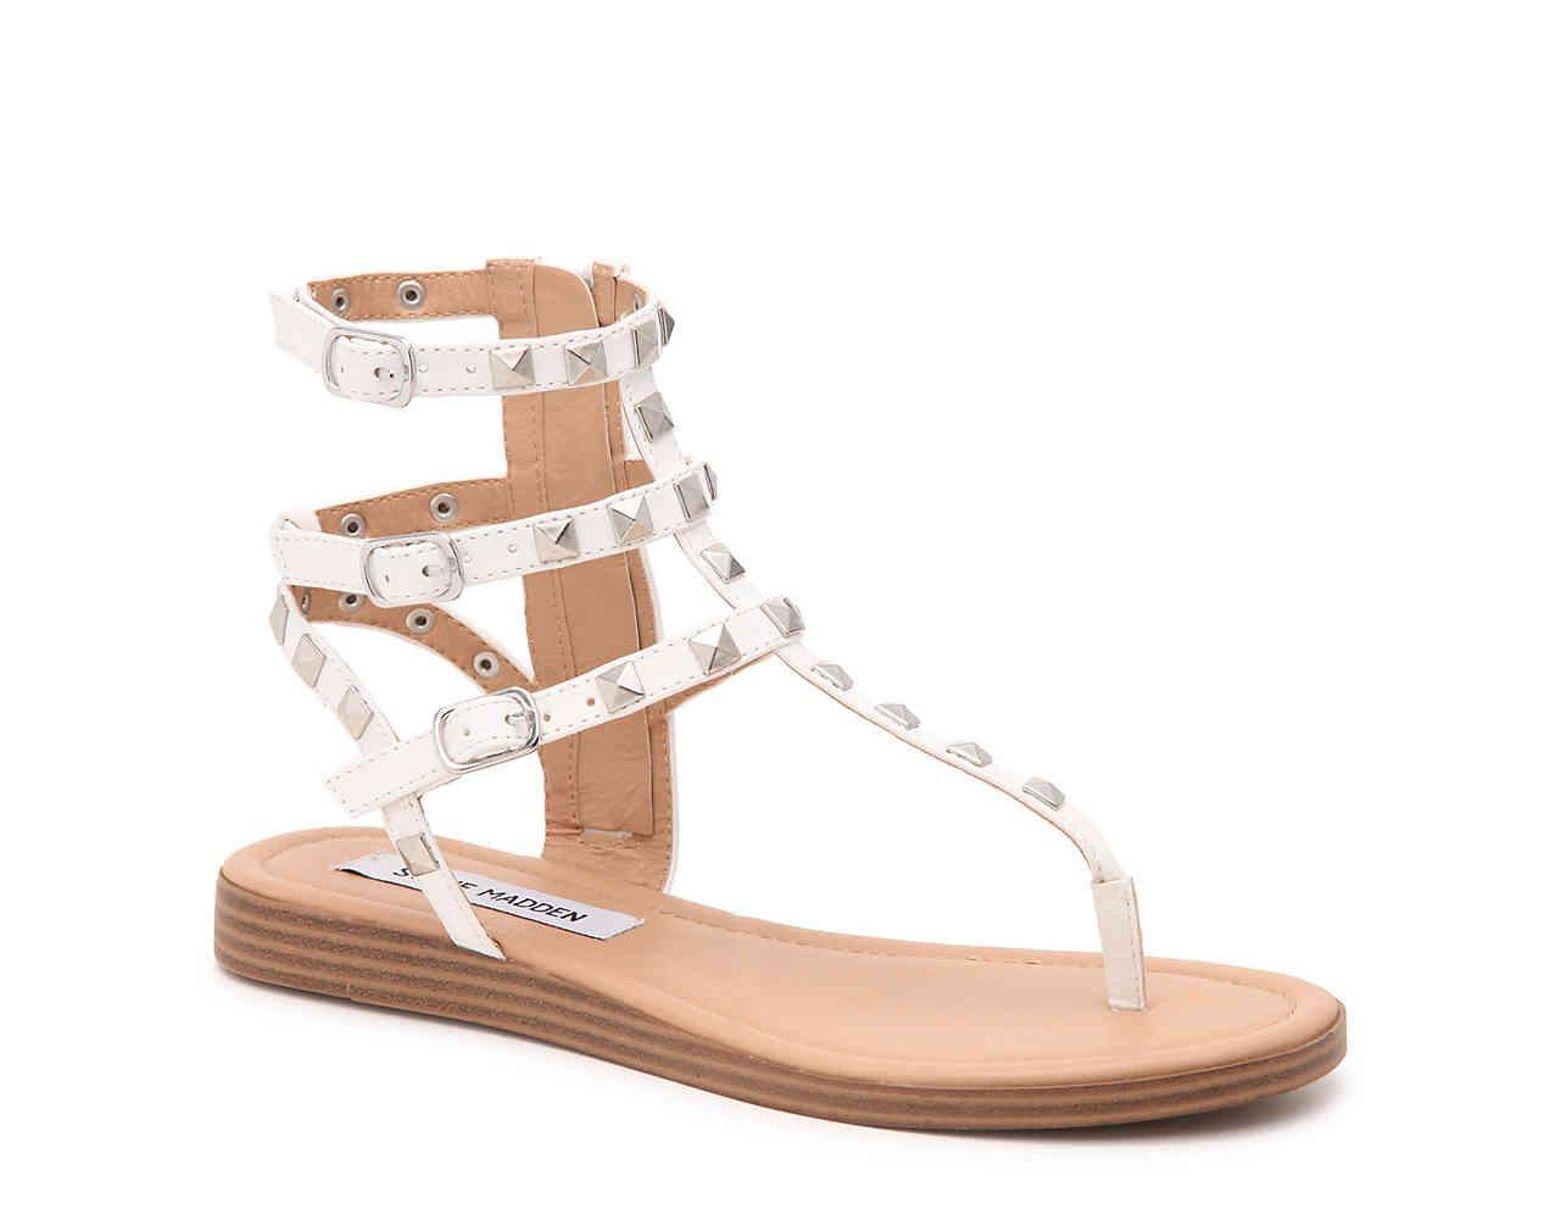 22d8dfd4f44 Women's White Kady Gladiator Sandal